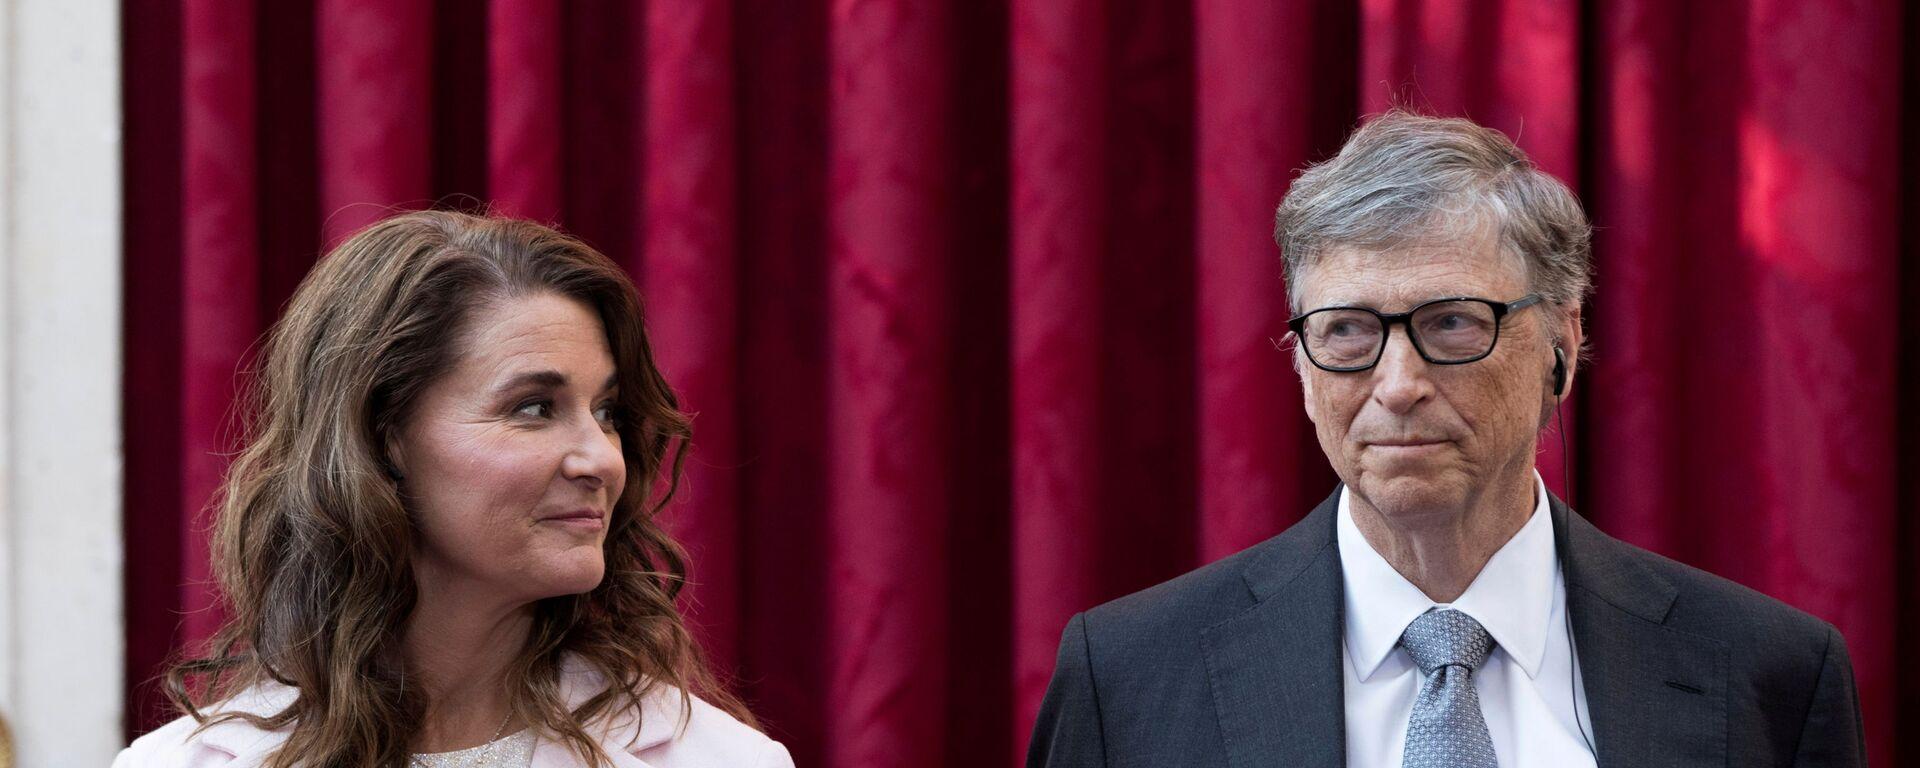 Melinda Gates- Bill Gates - Sputnik Türkiye, 1920, 14.07.2021